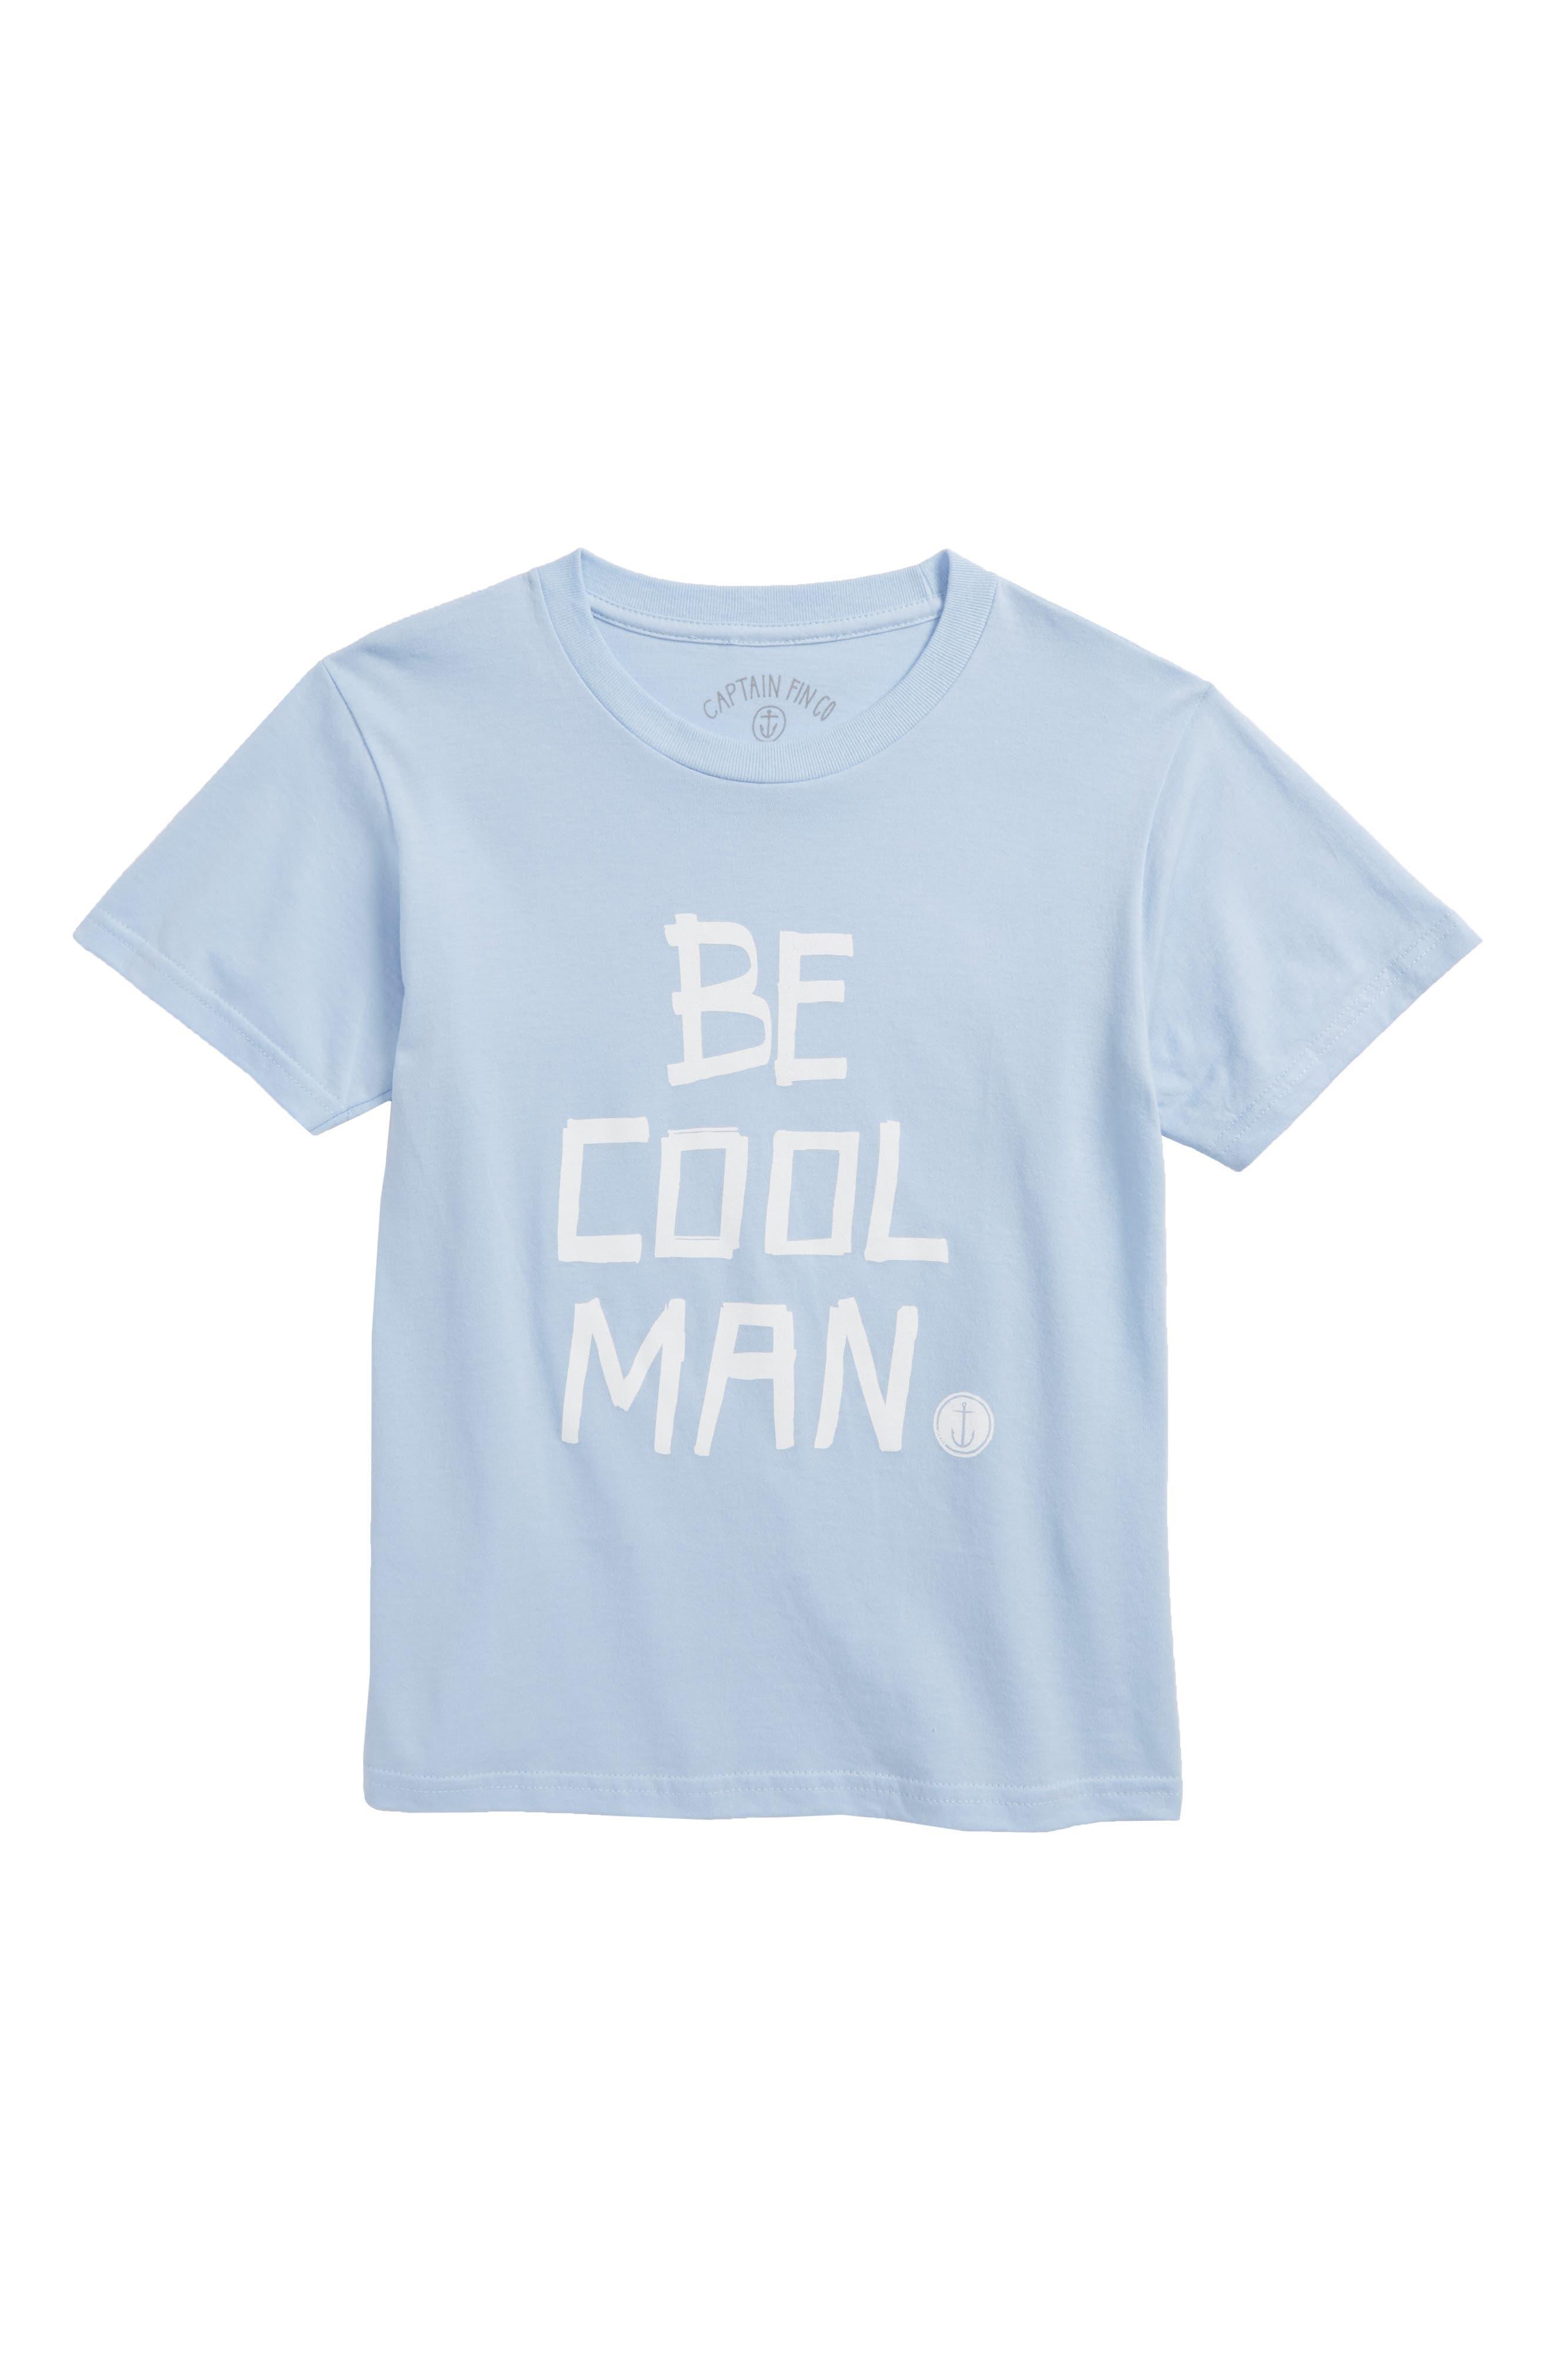 Captin Fin Be Cool Man Graphic T-Shirt,                             Main thumbnail 1, color,                             450